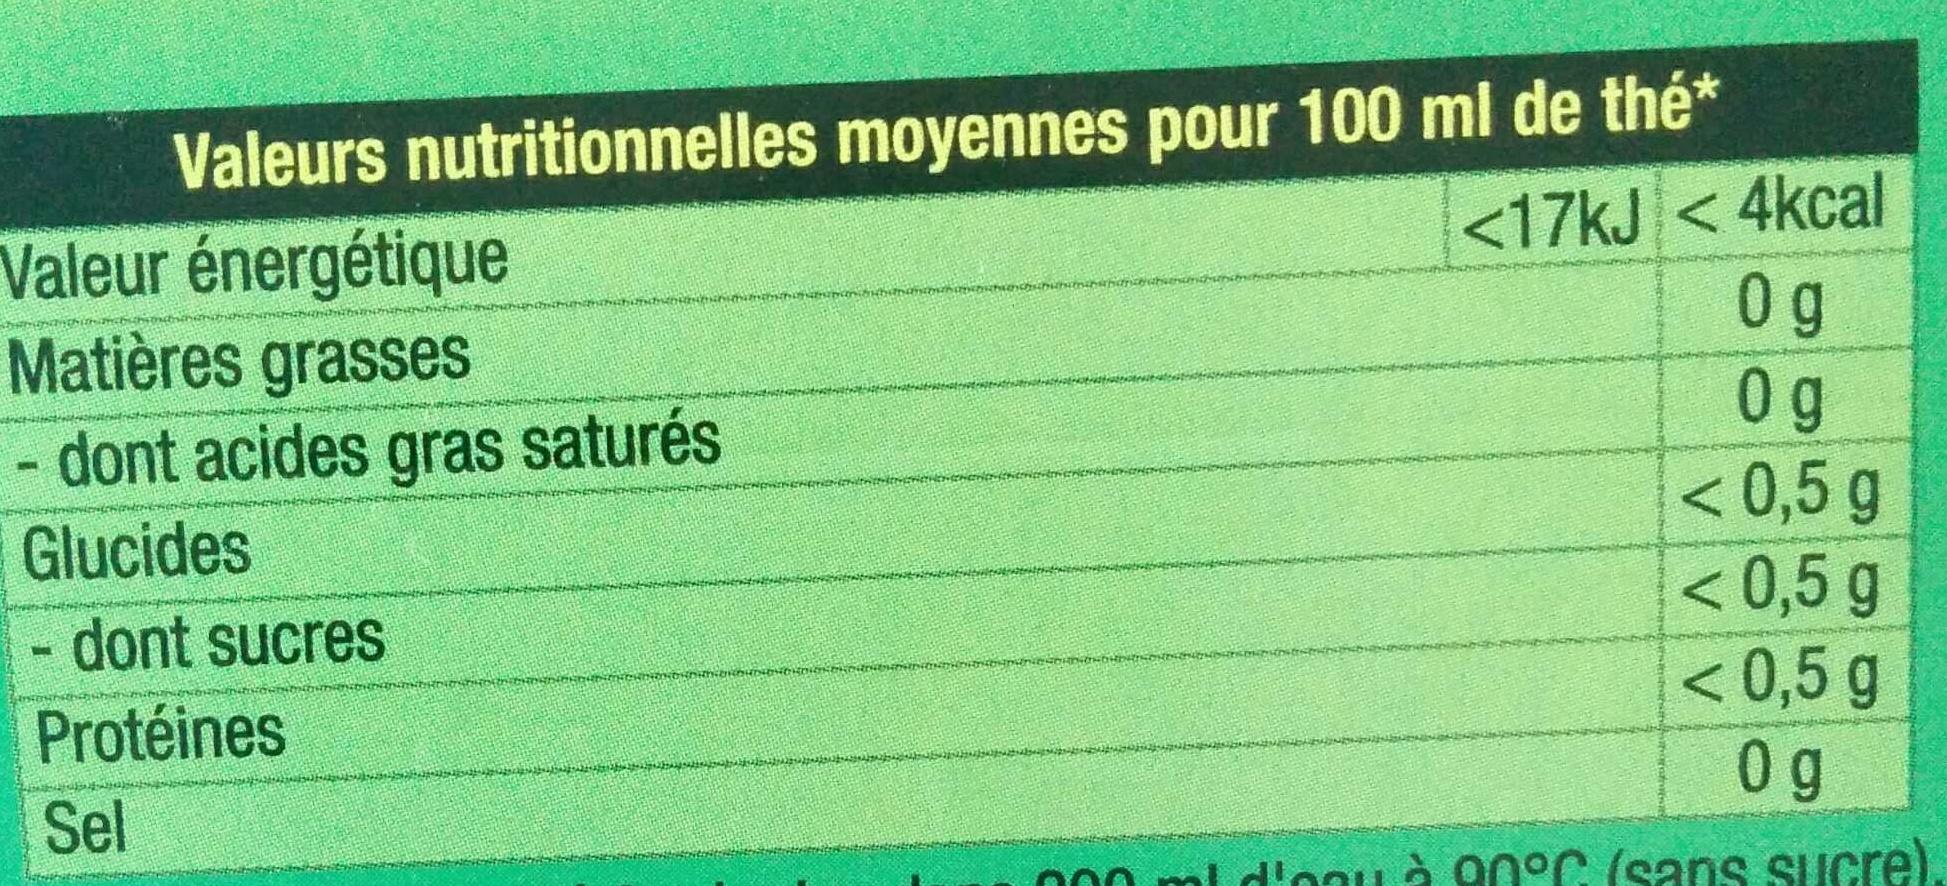 Lipton Thé Vert Menthe 30 Sachets - Informació nutricional